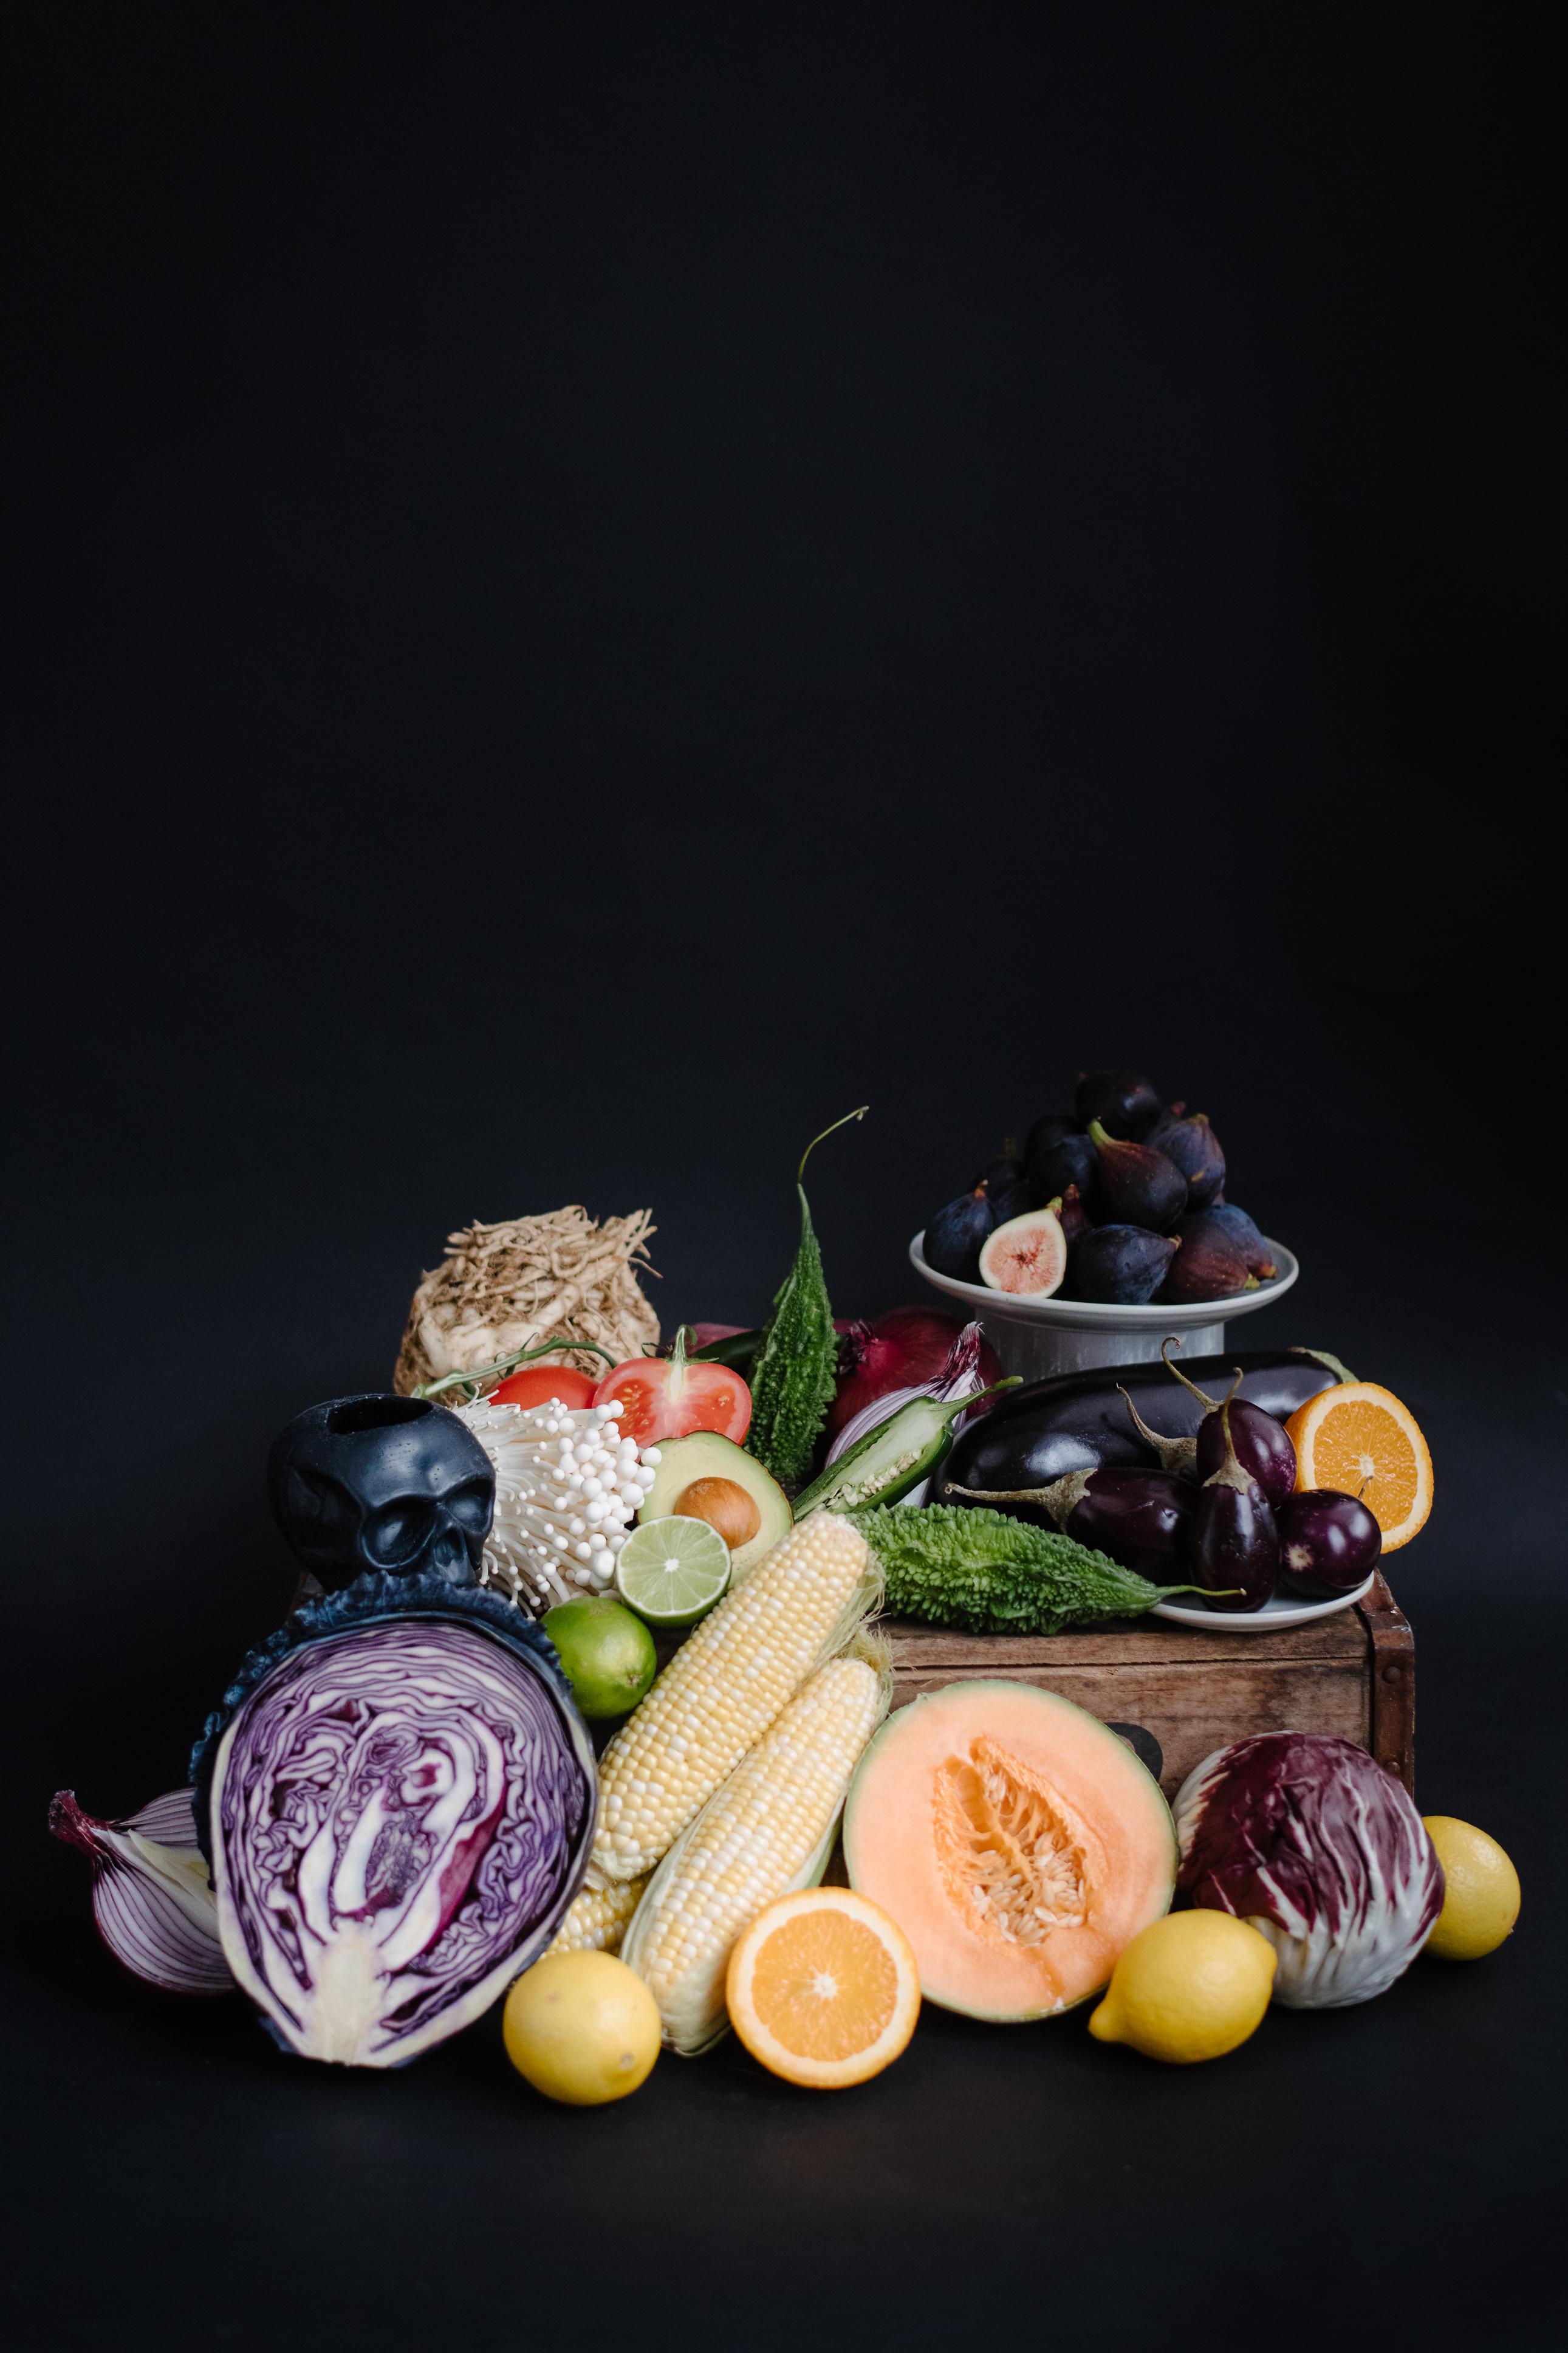 Toronto Food Photographer